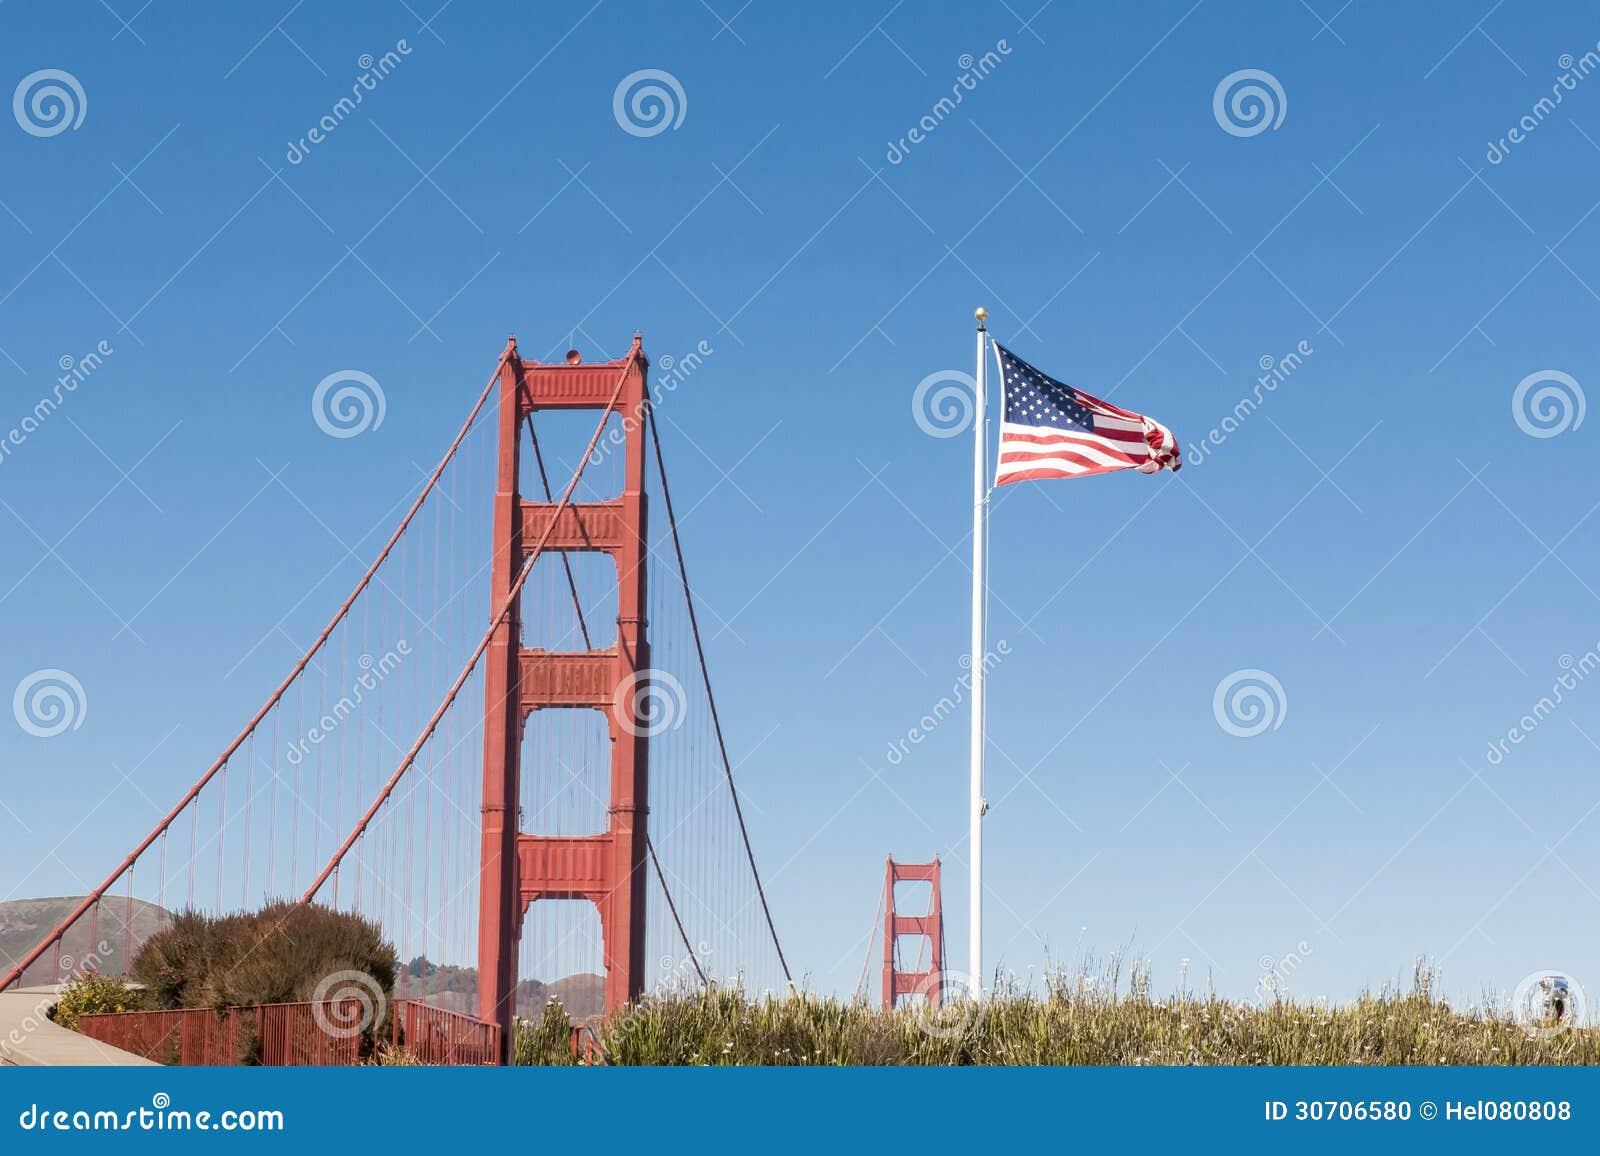 Golden Gate Bridge, US Flag